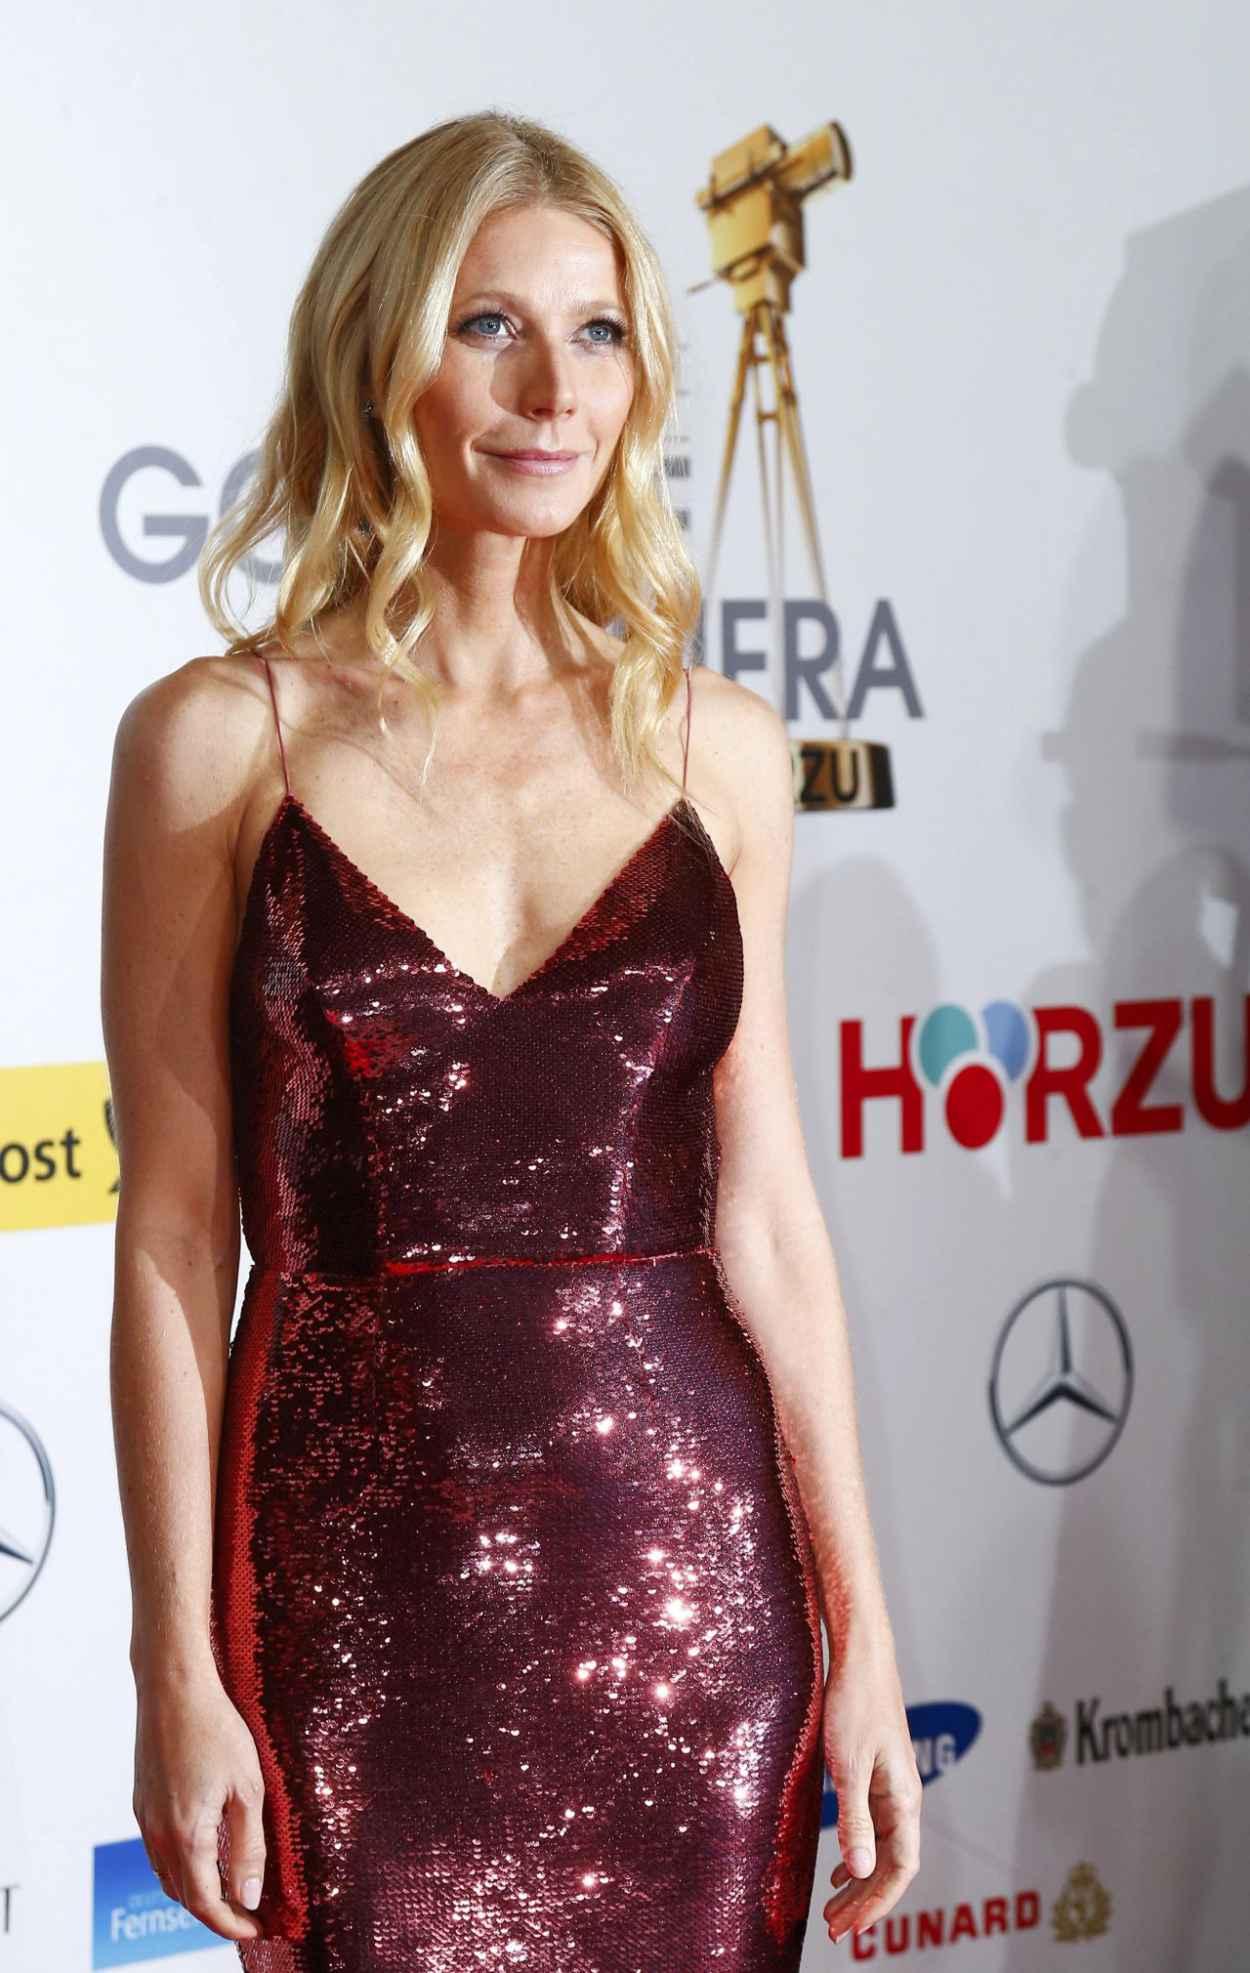 Gwyneth Paltrow - 49th Golden Camera Award from Hoerzu at Tempelhof Airport-1